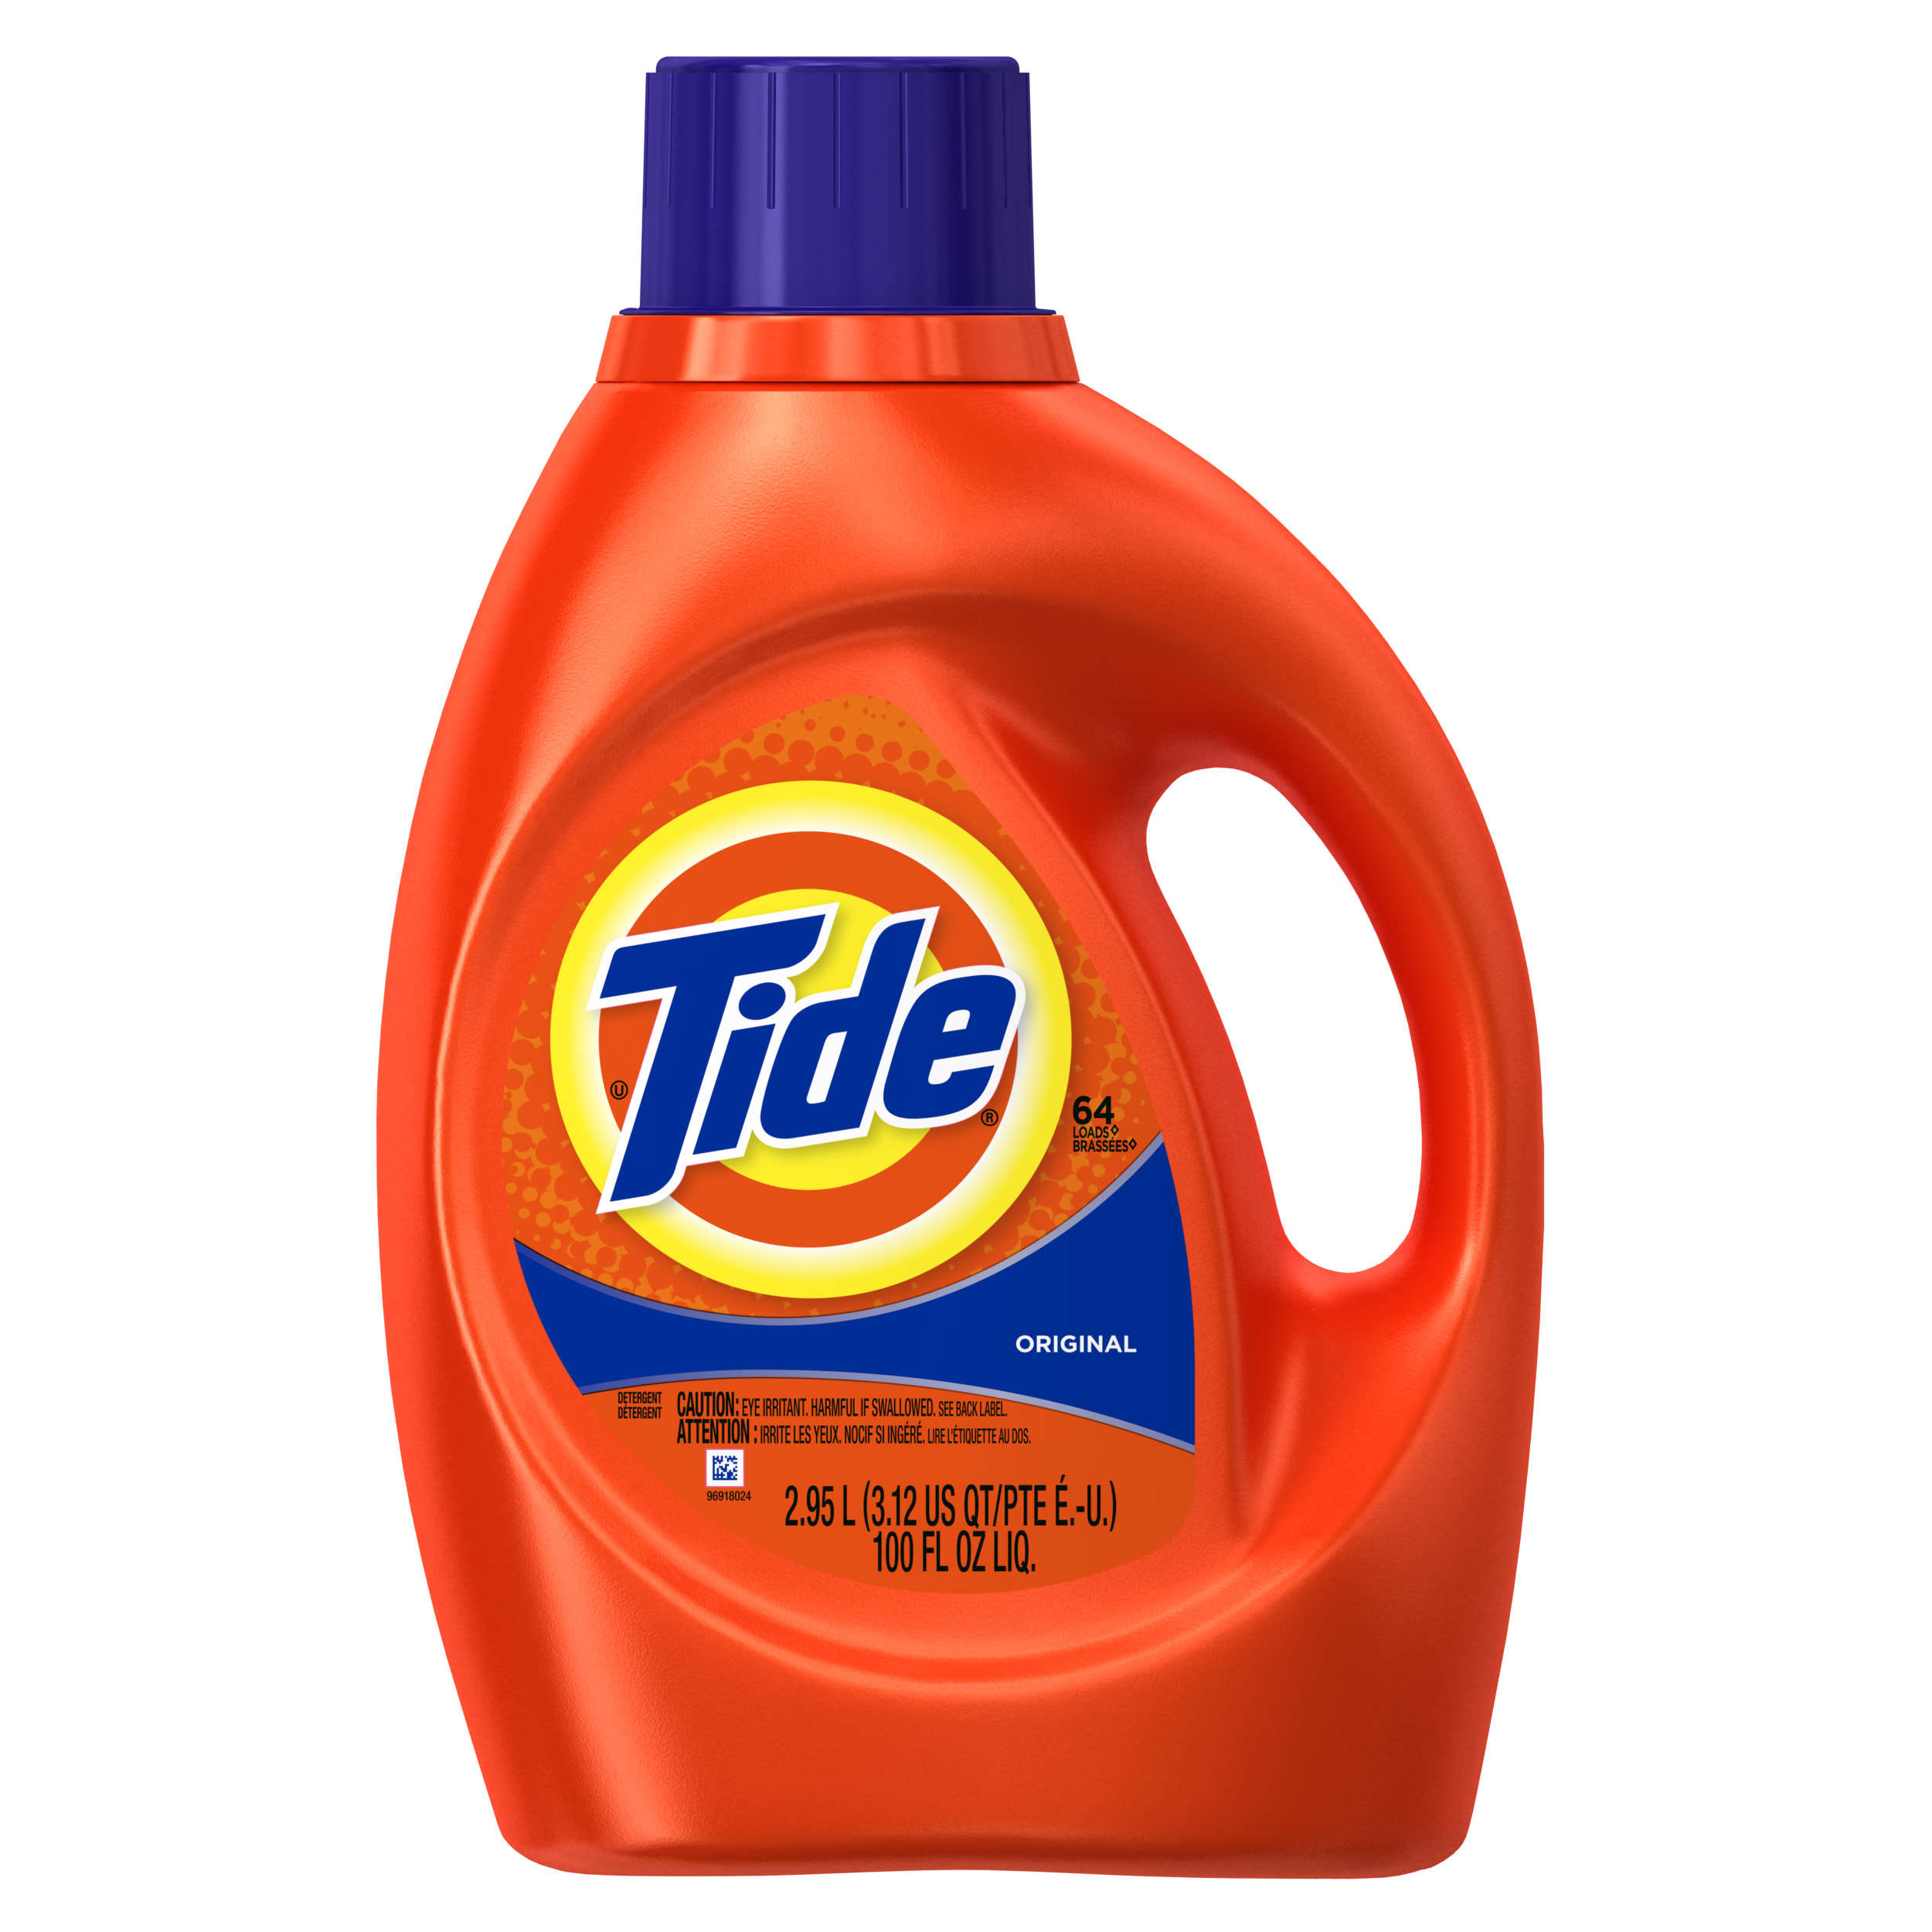 Tide Original Scent Liquid Laundry Detergent, 64 Loads, 100 Oz